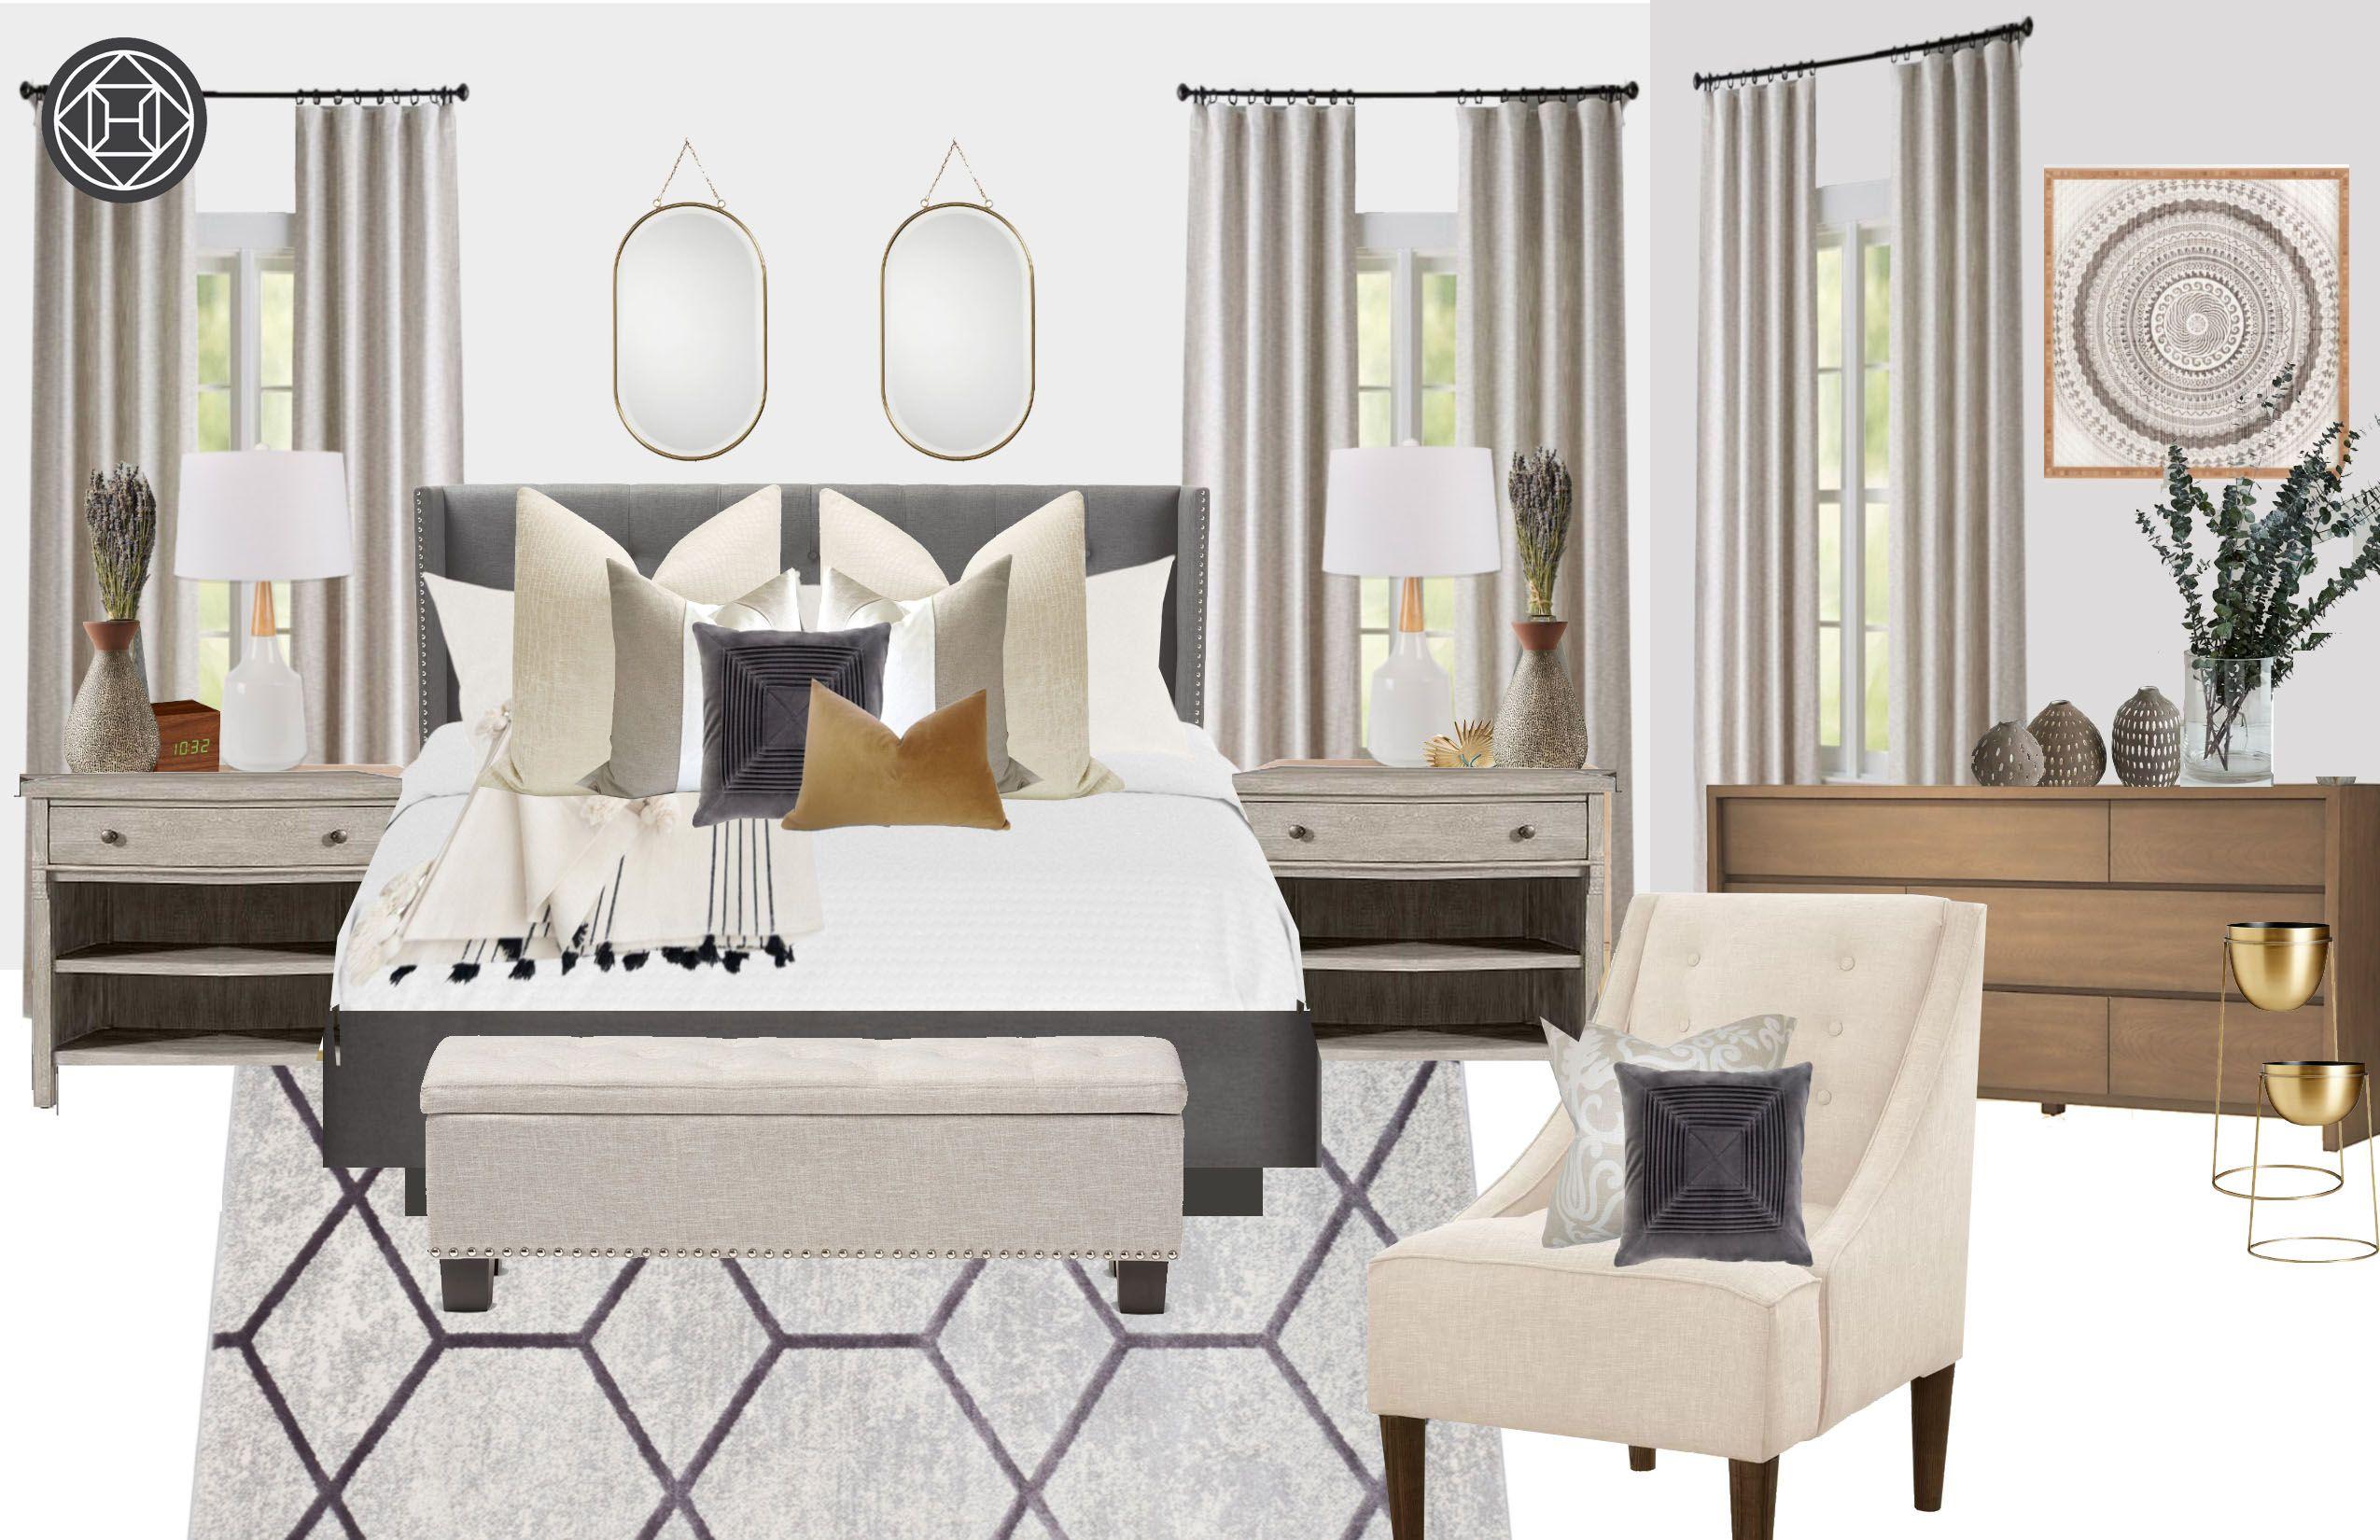 Online Interior Design And Home Inspiration Interior Design